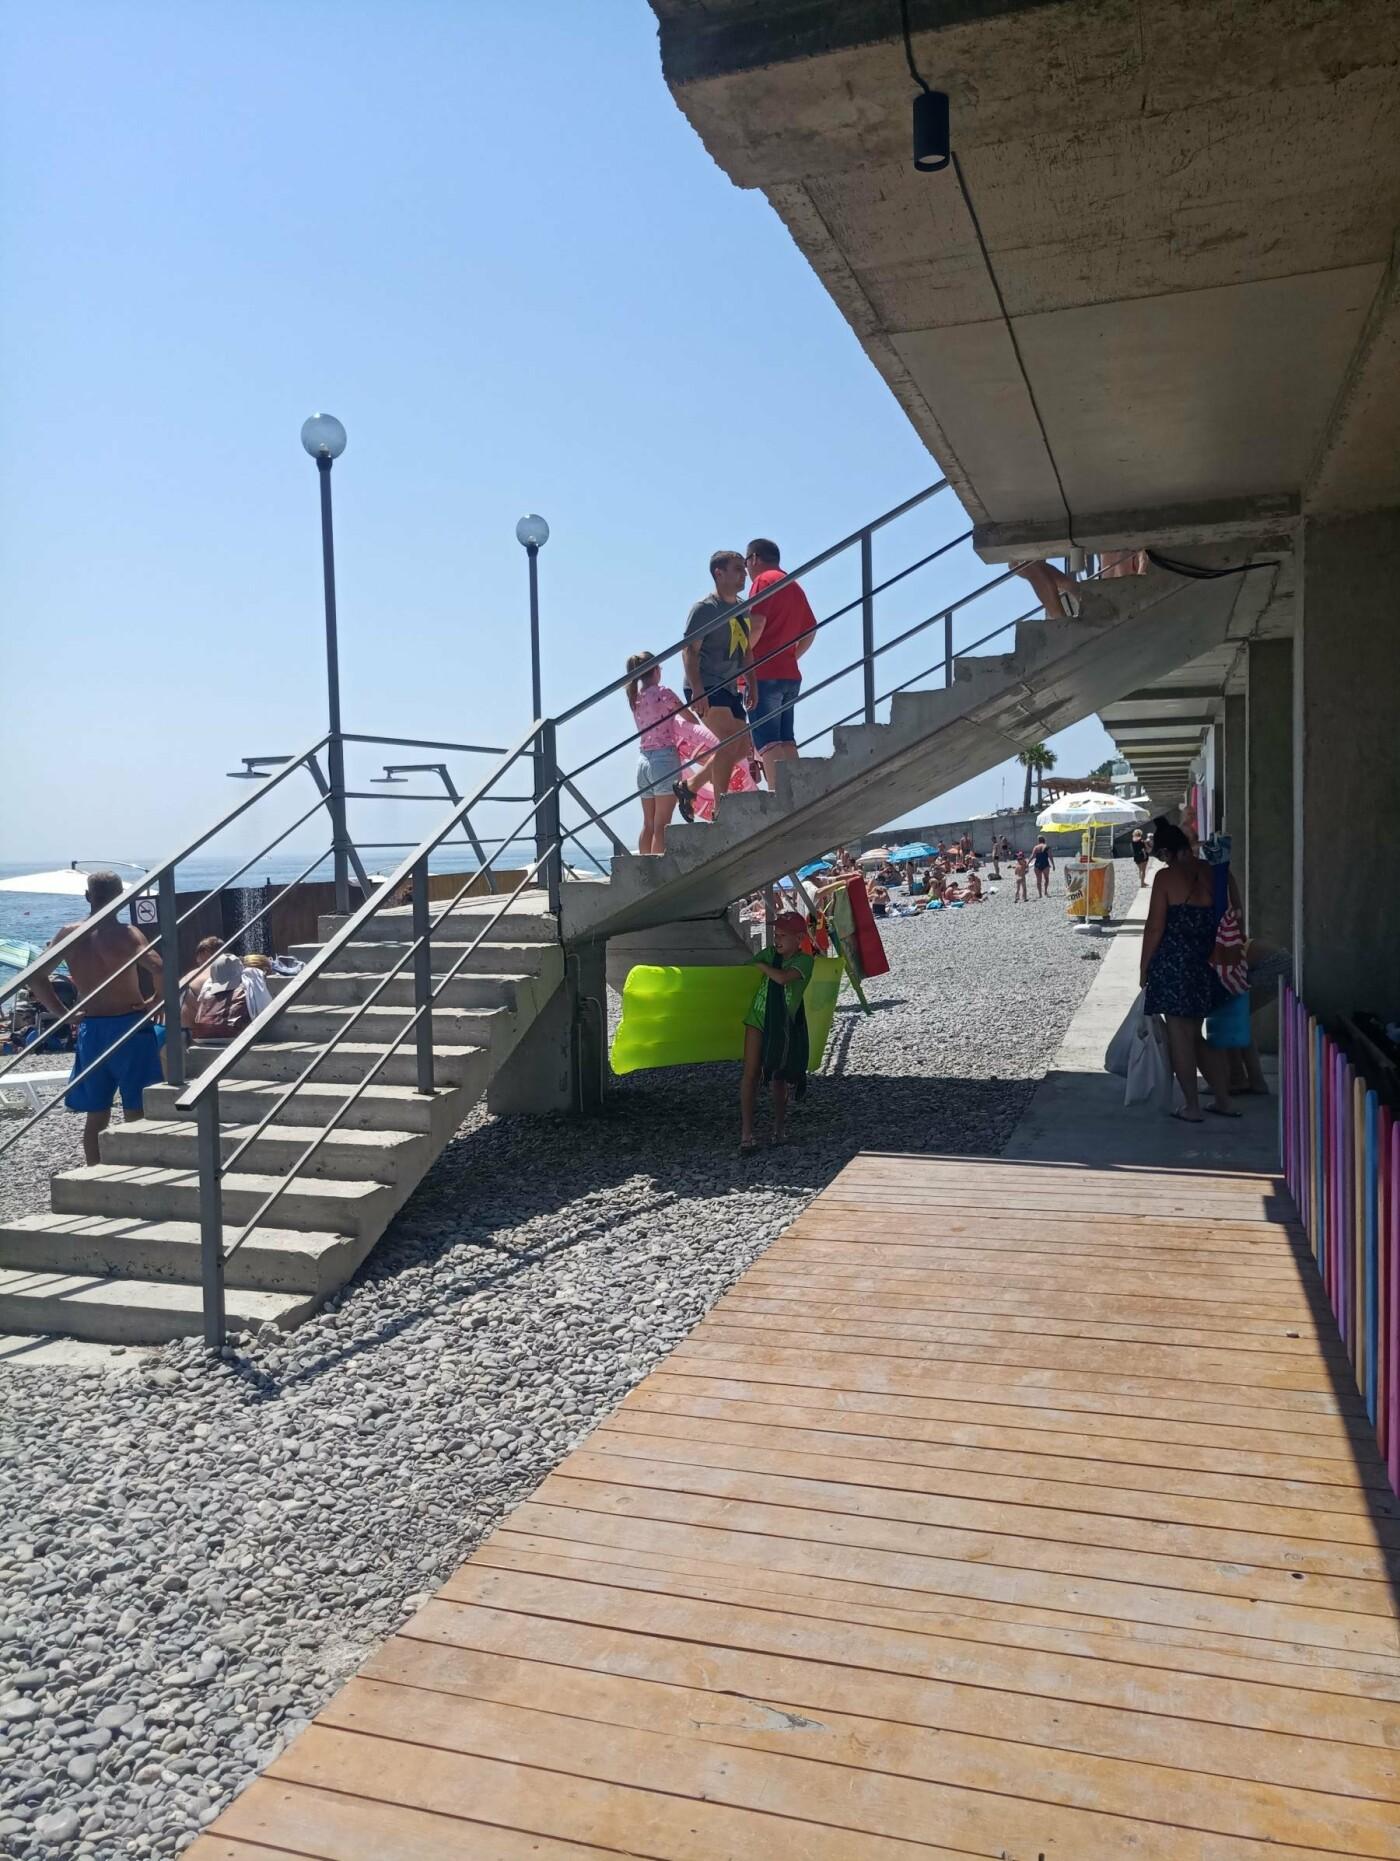 Ялта без барьеров: проверка условно доступного моря, фото-2